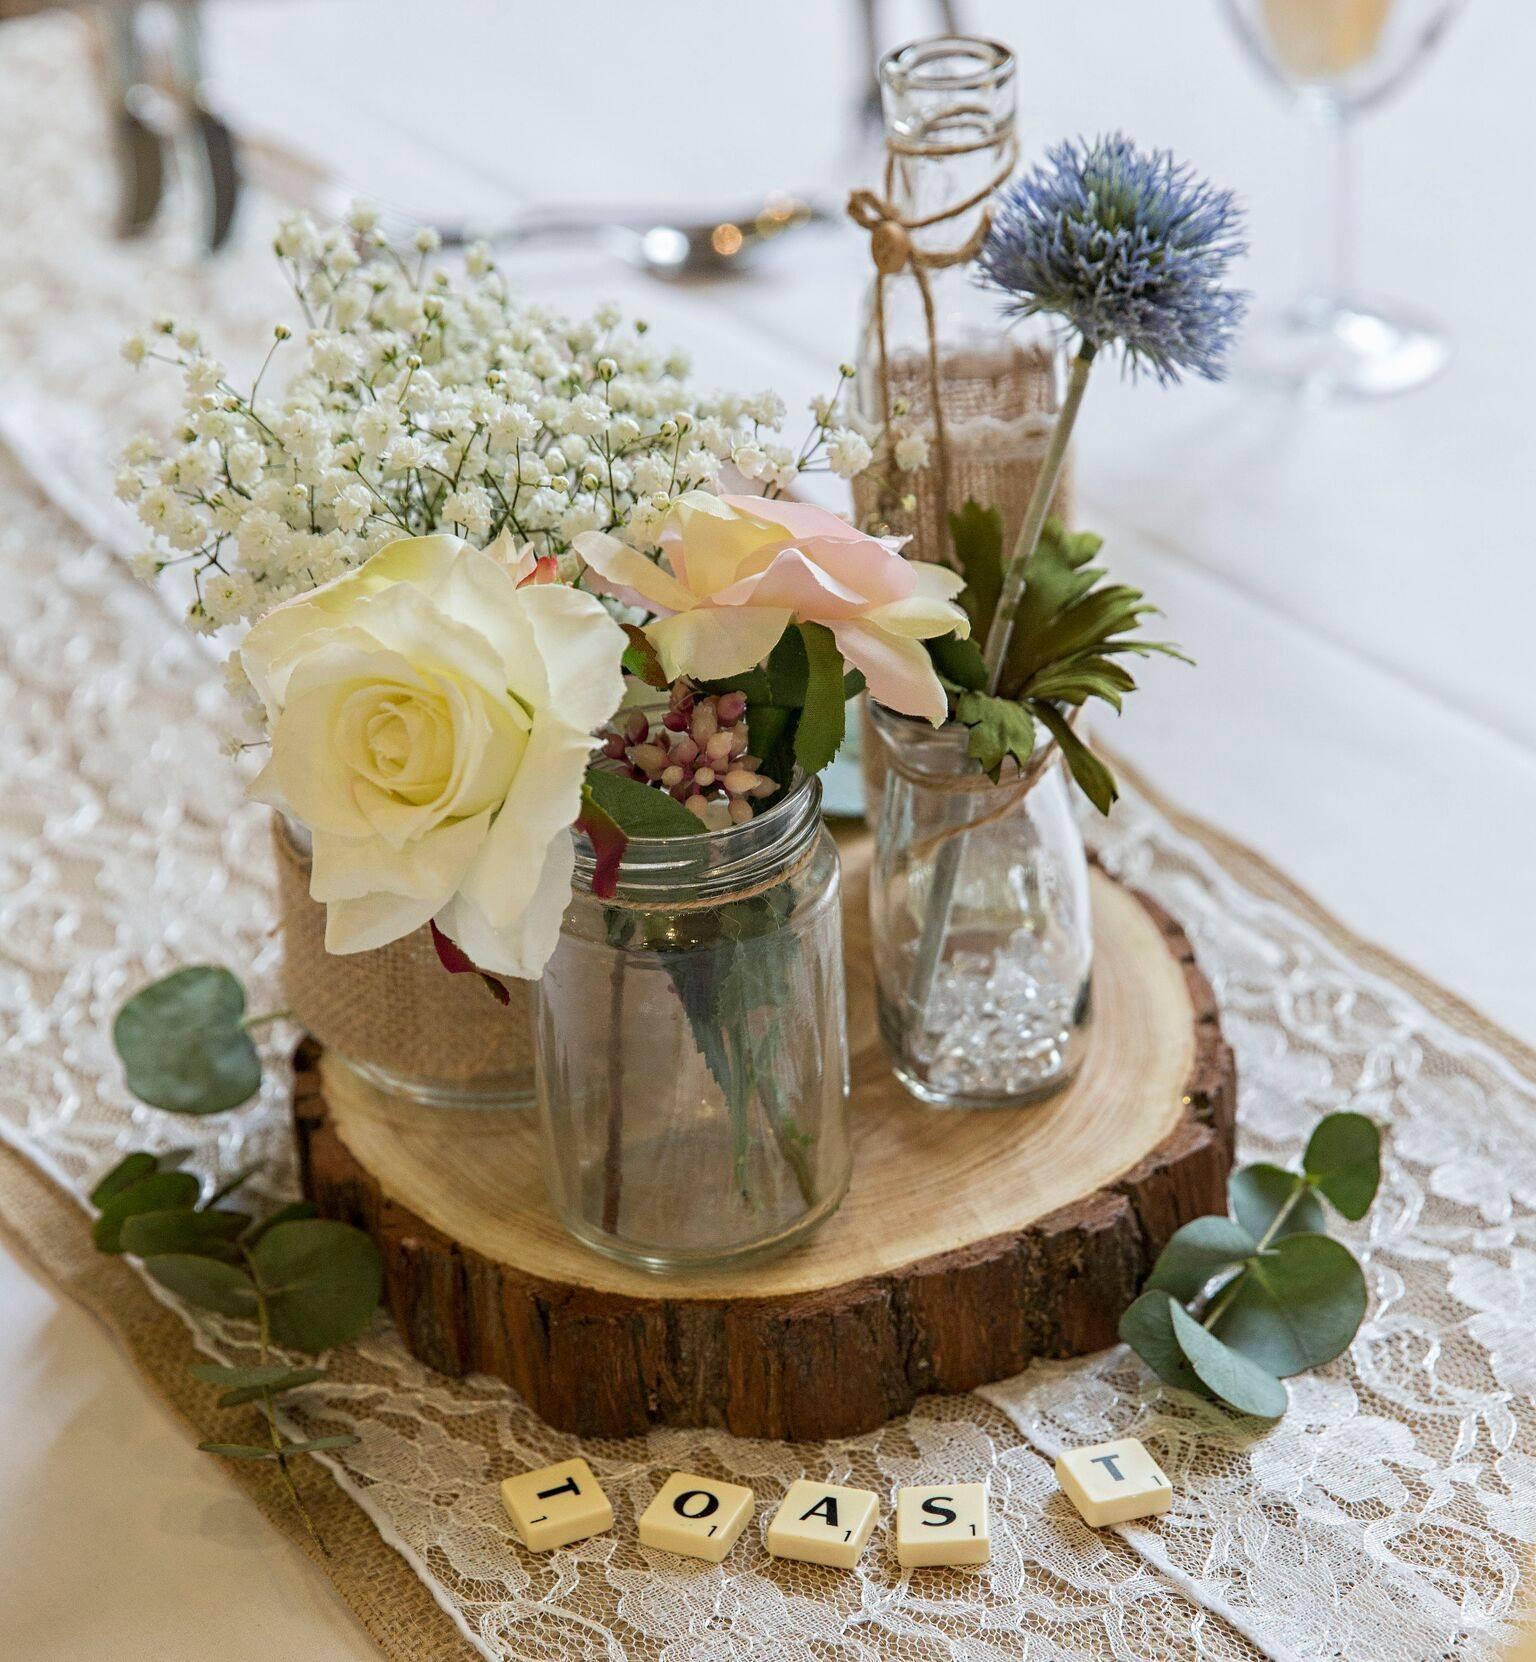 Pastel Pinks - Rustic Logs Sophia's Final Touch - Venue Styling - Weddings